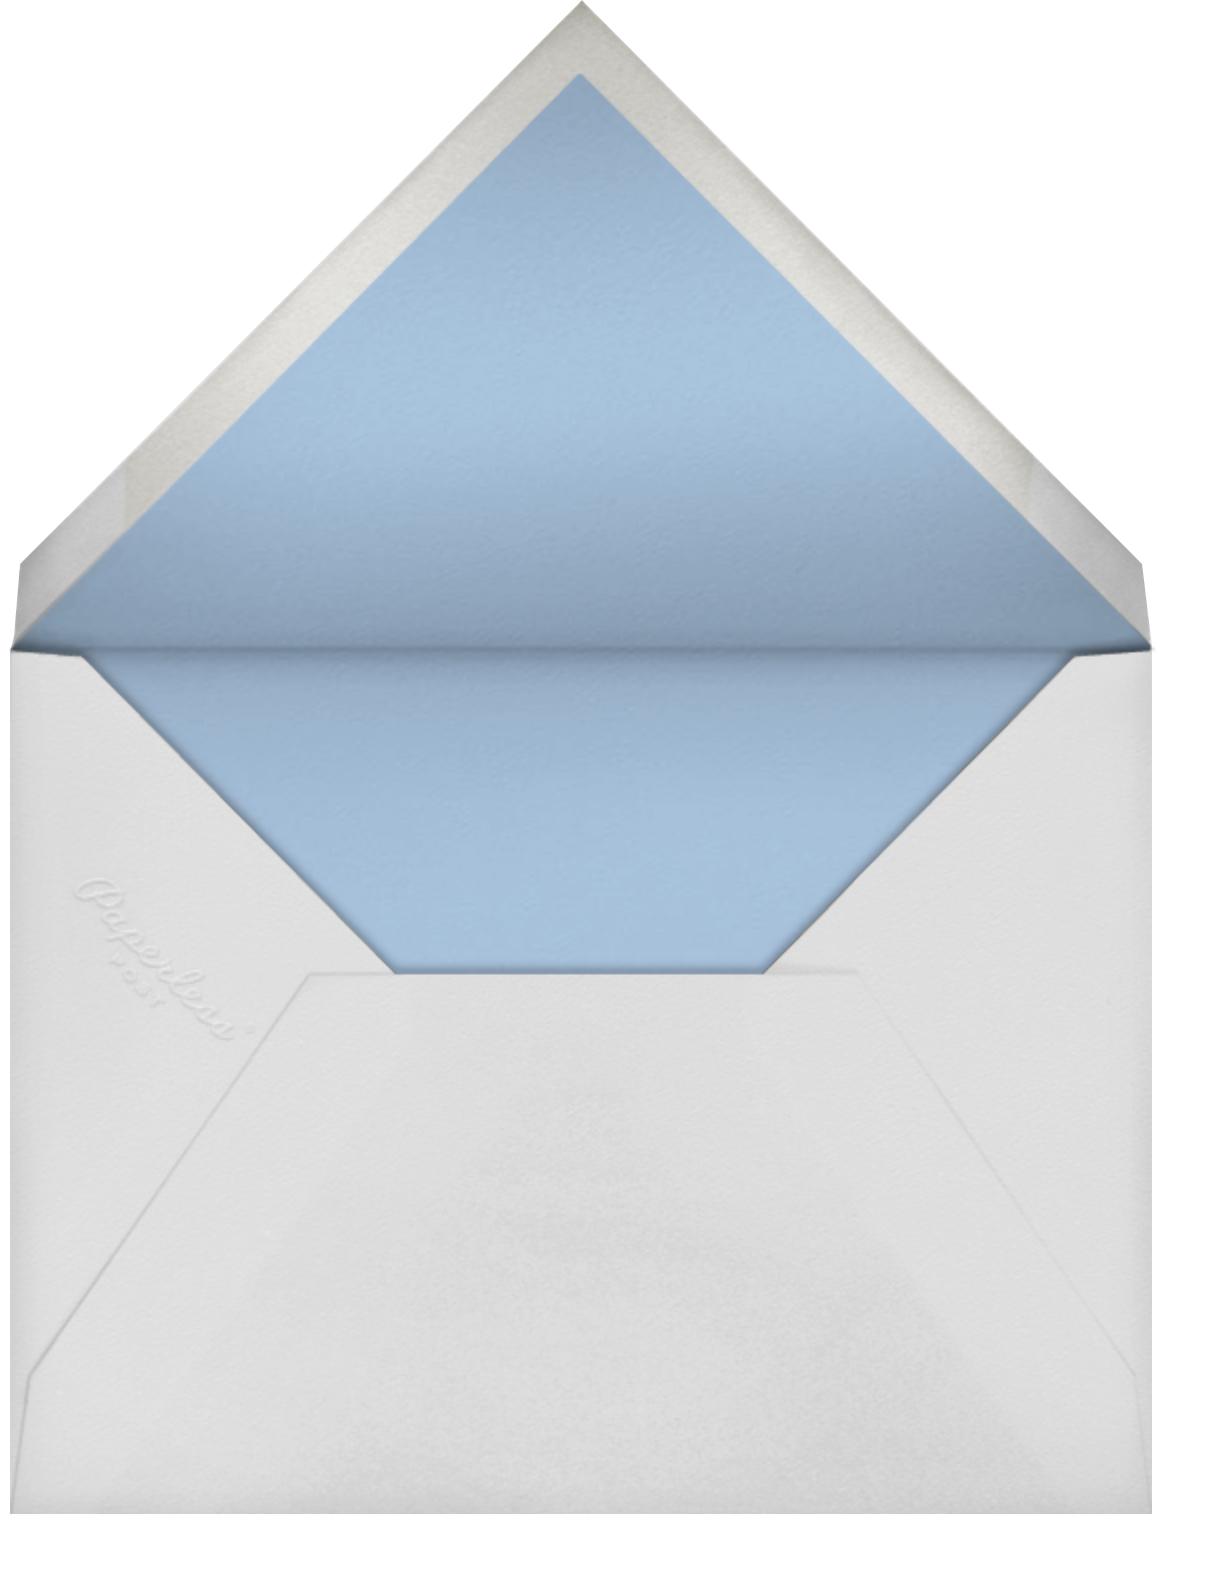 Ottoman Floral - White/Lapis - Oscar de la Renta - Adult birthday - envelope back